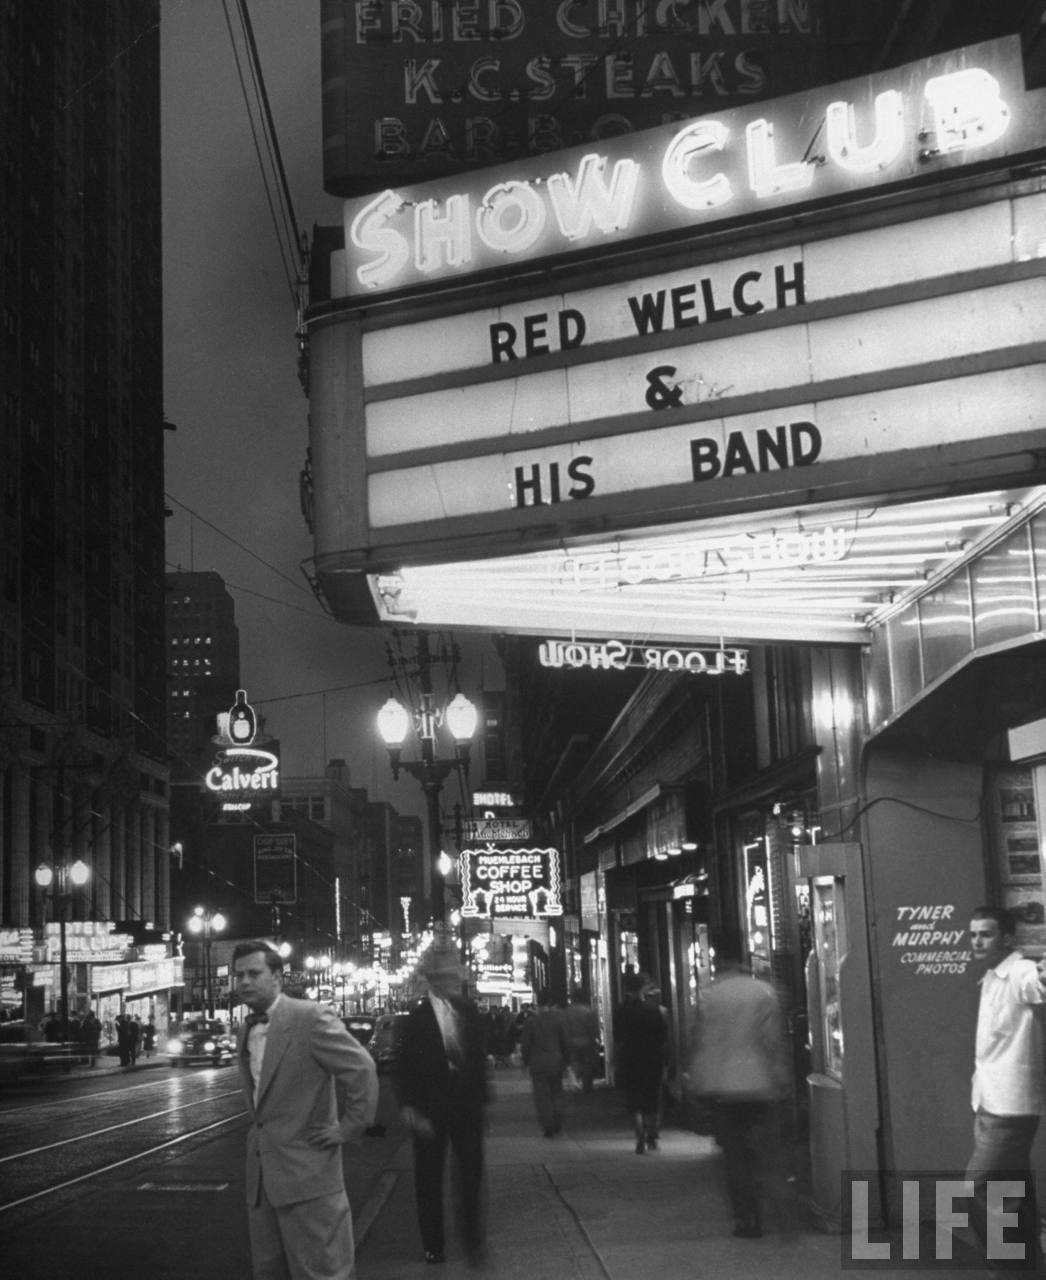 Show club where gambling was taking place during the gambling conspiracy.